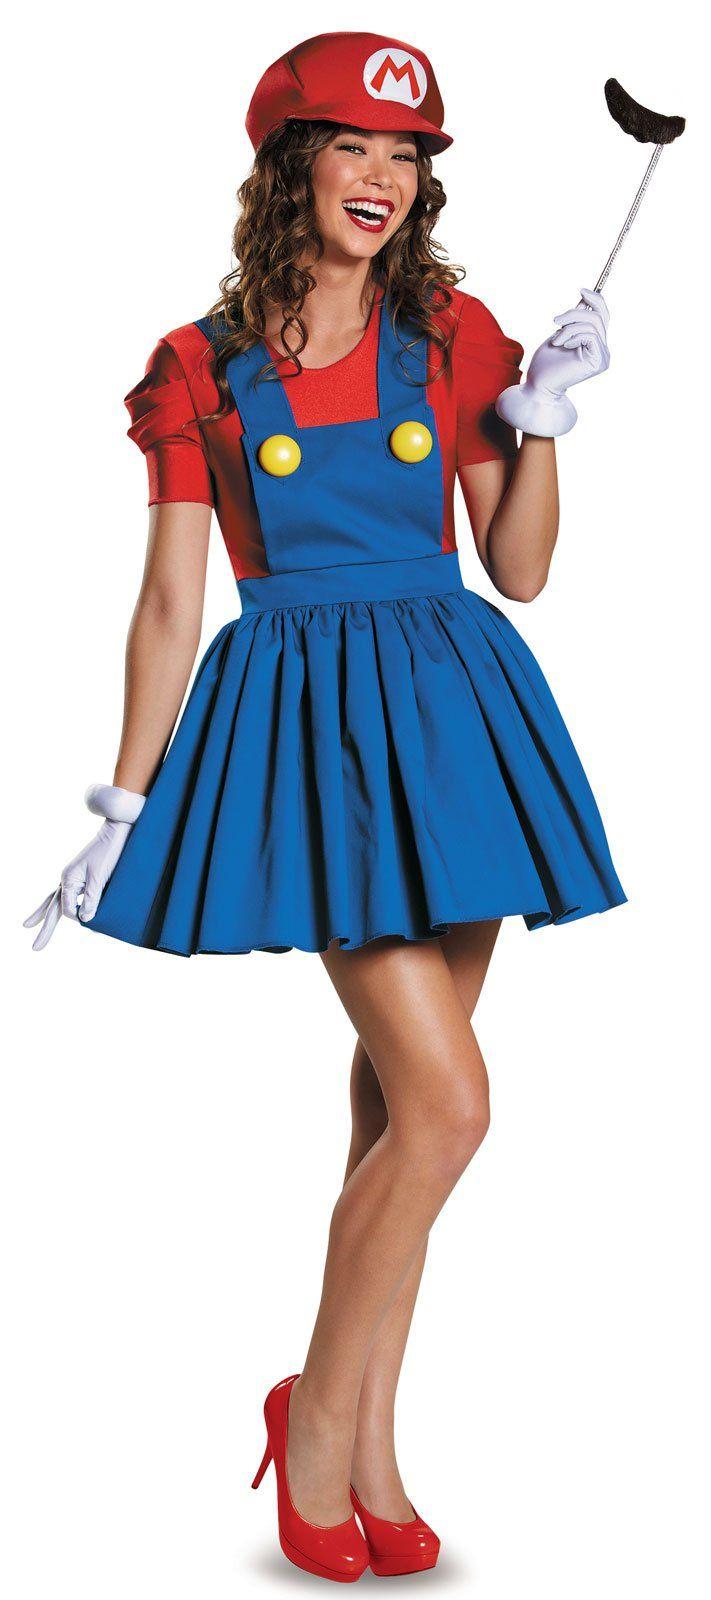 Super Mario: Mario Tween Costume With Skirt from Buycostumes.com